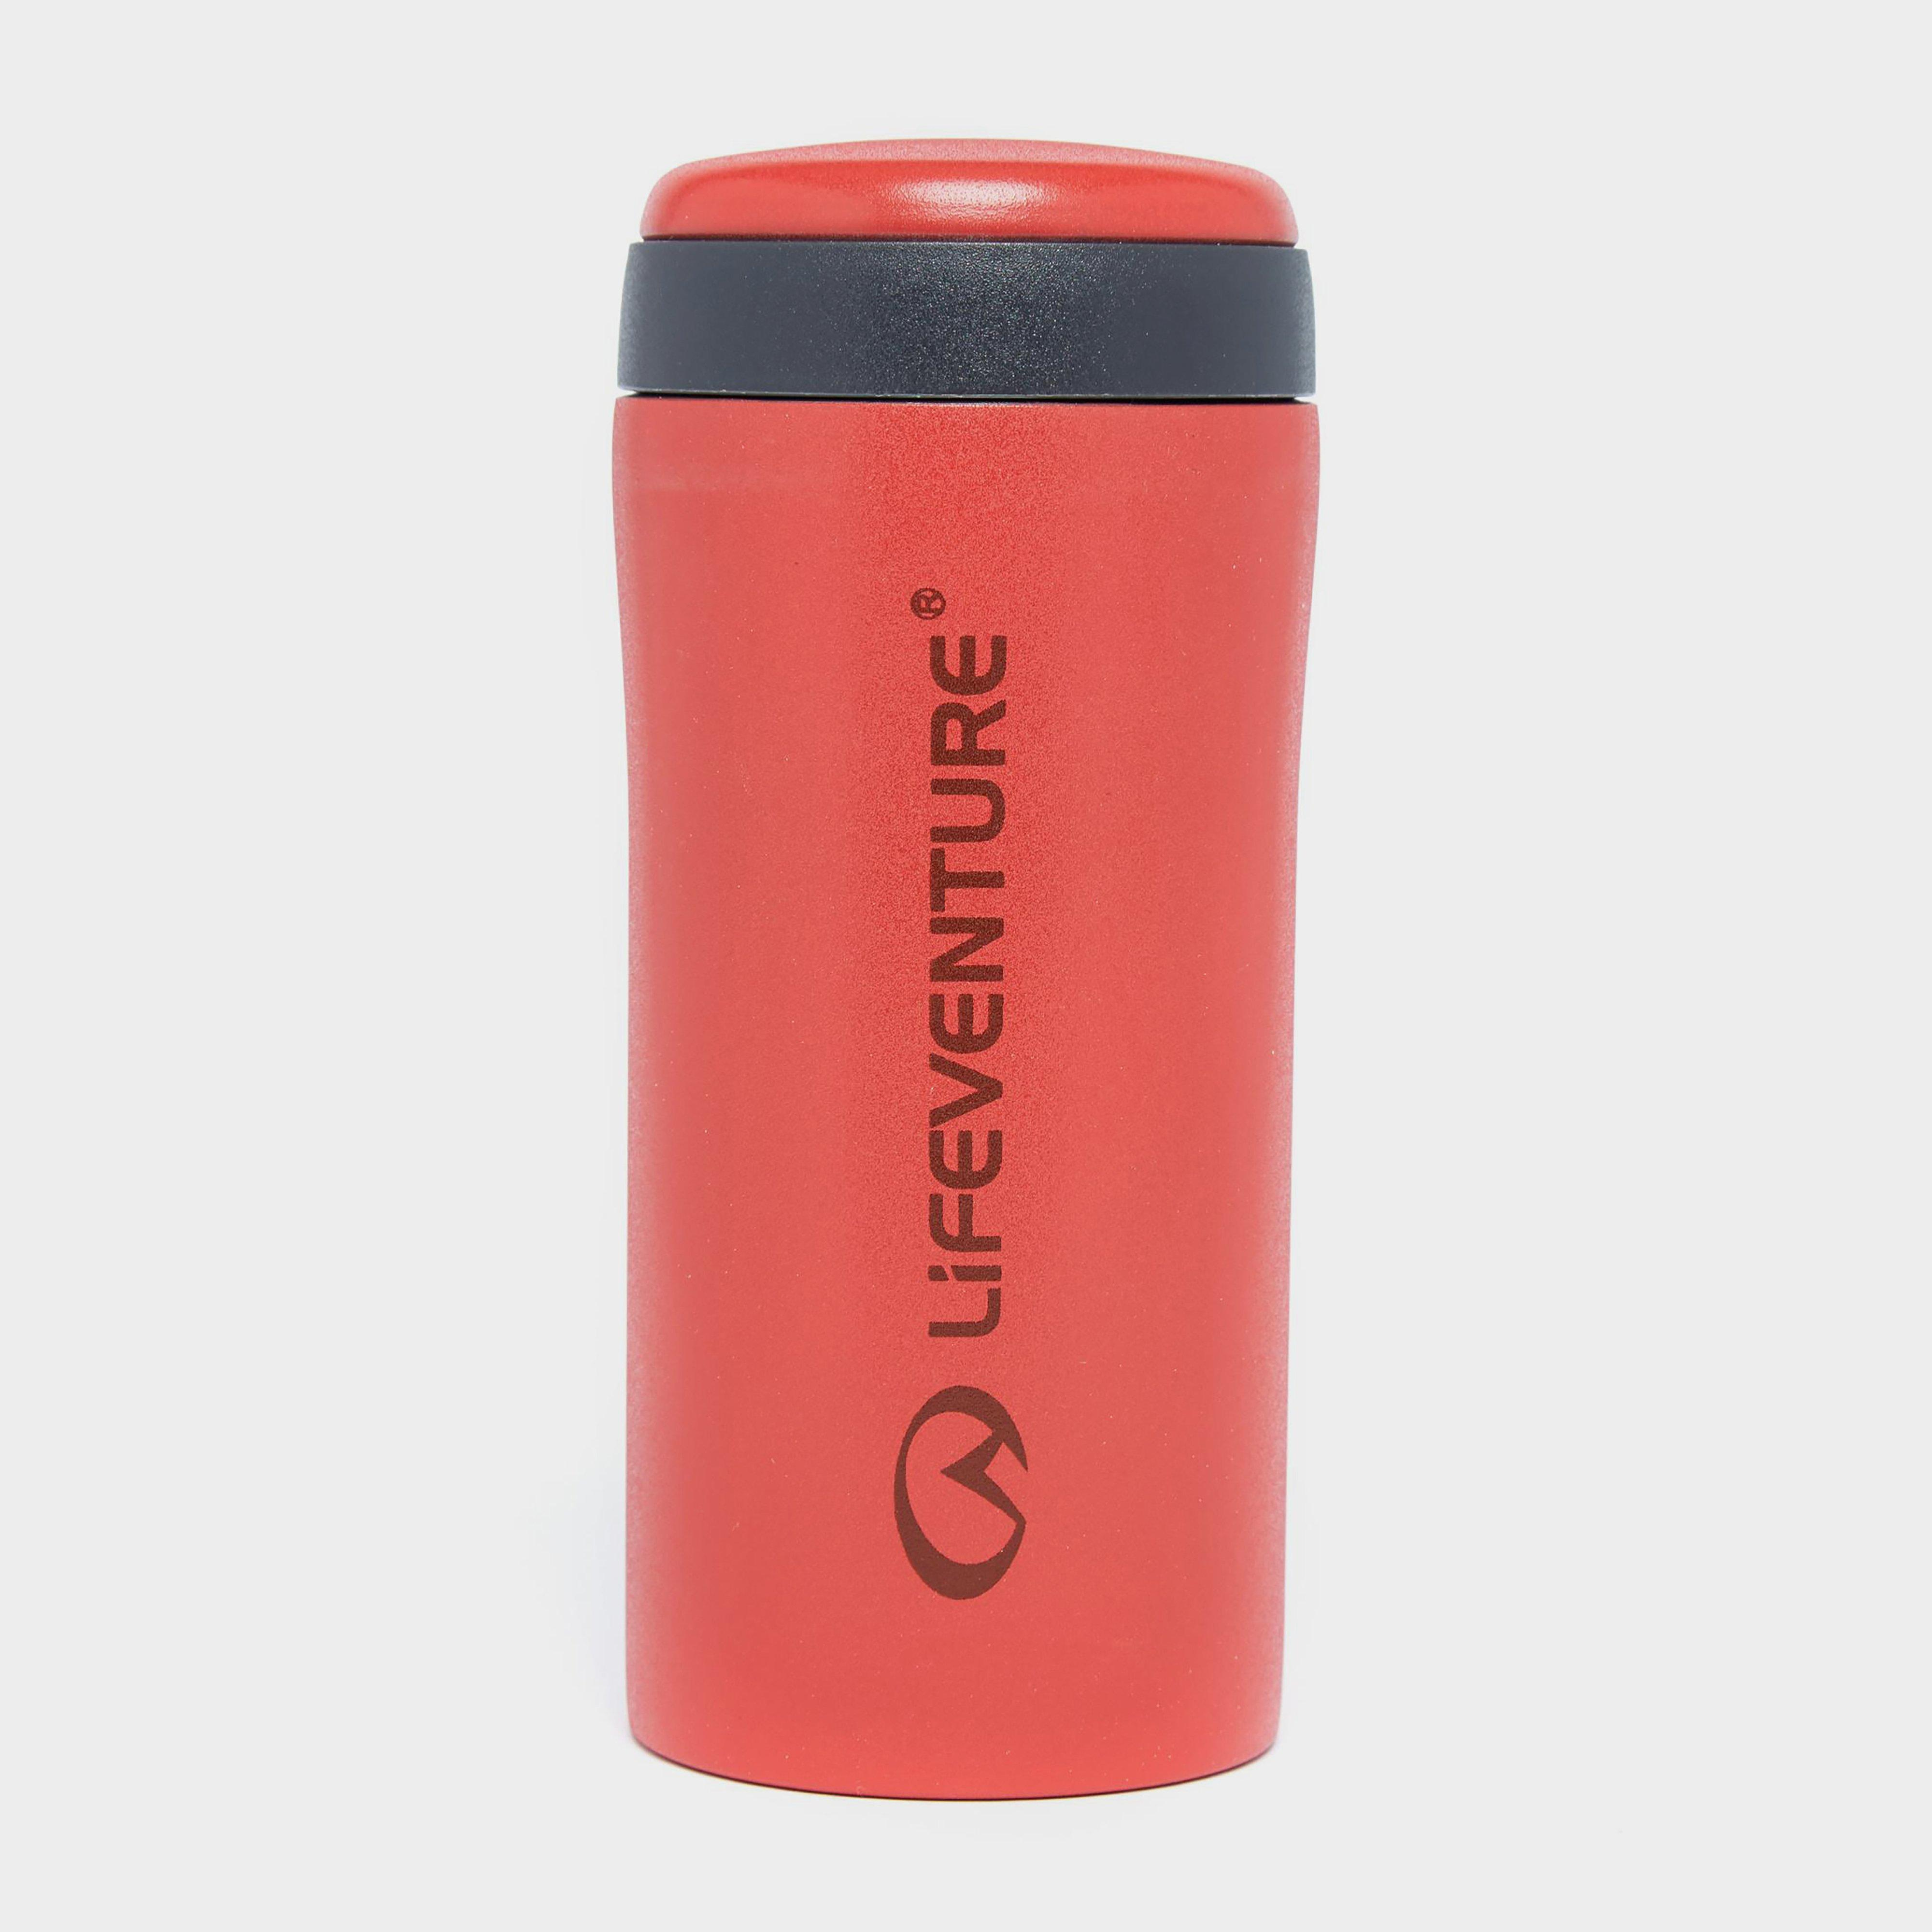 Lifeventure Lifeventure Thermal Mug - Red, Red